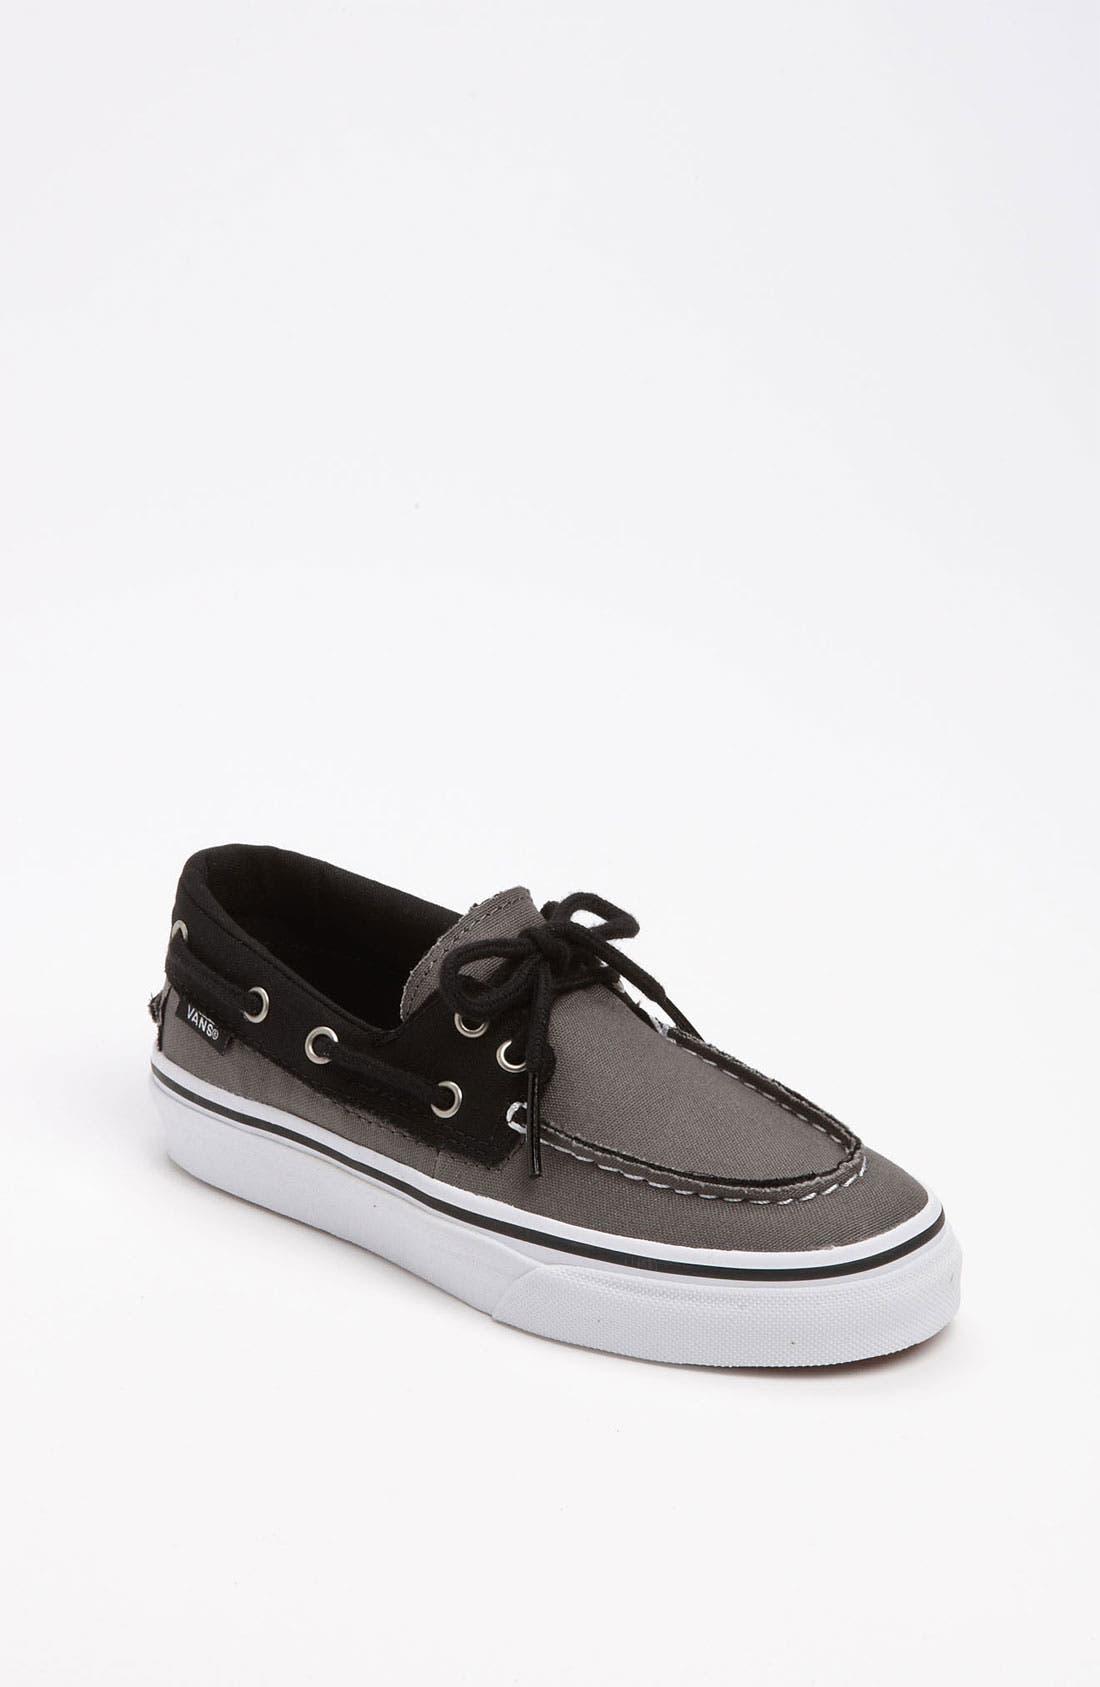 Alternate Image 1 Selected - Vans 'Zapato del Barco' Boat Shoe (Baby, Walker, Toddler, Little Kid & Big Kid)